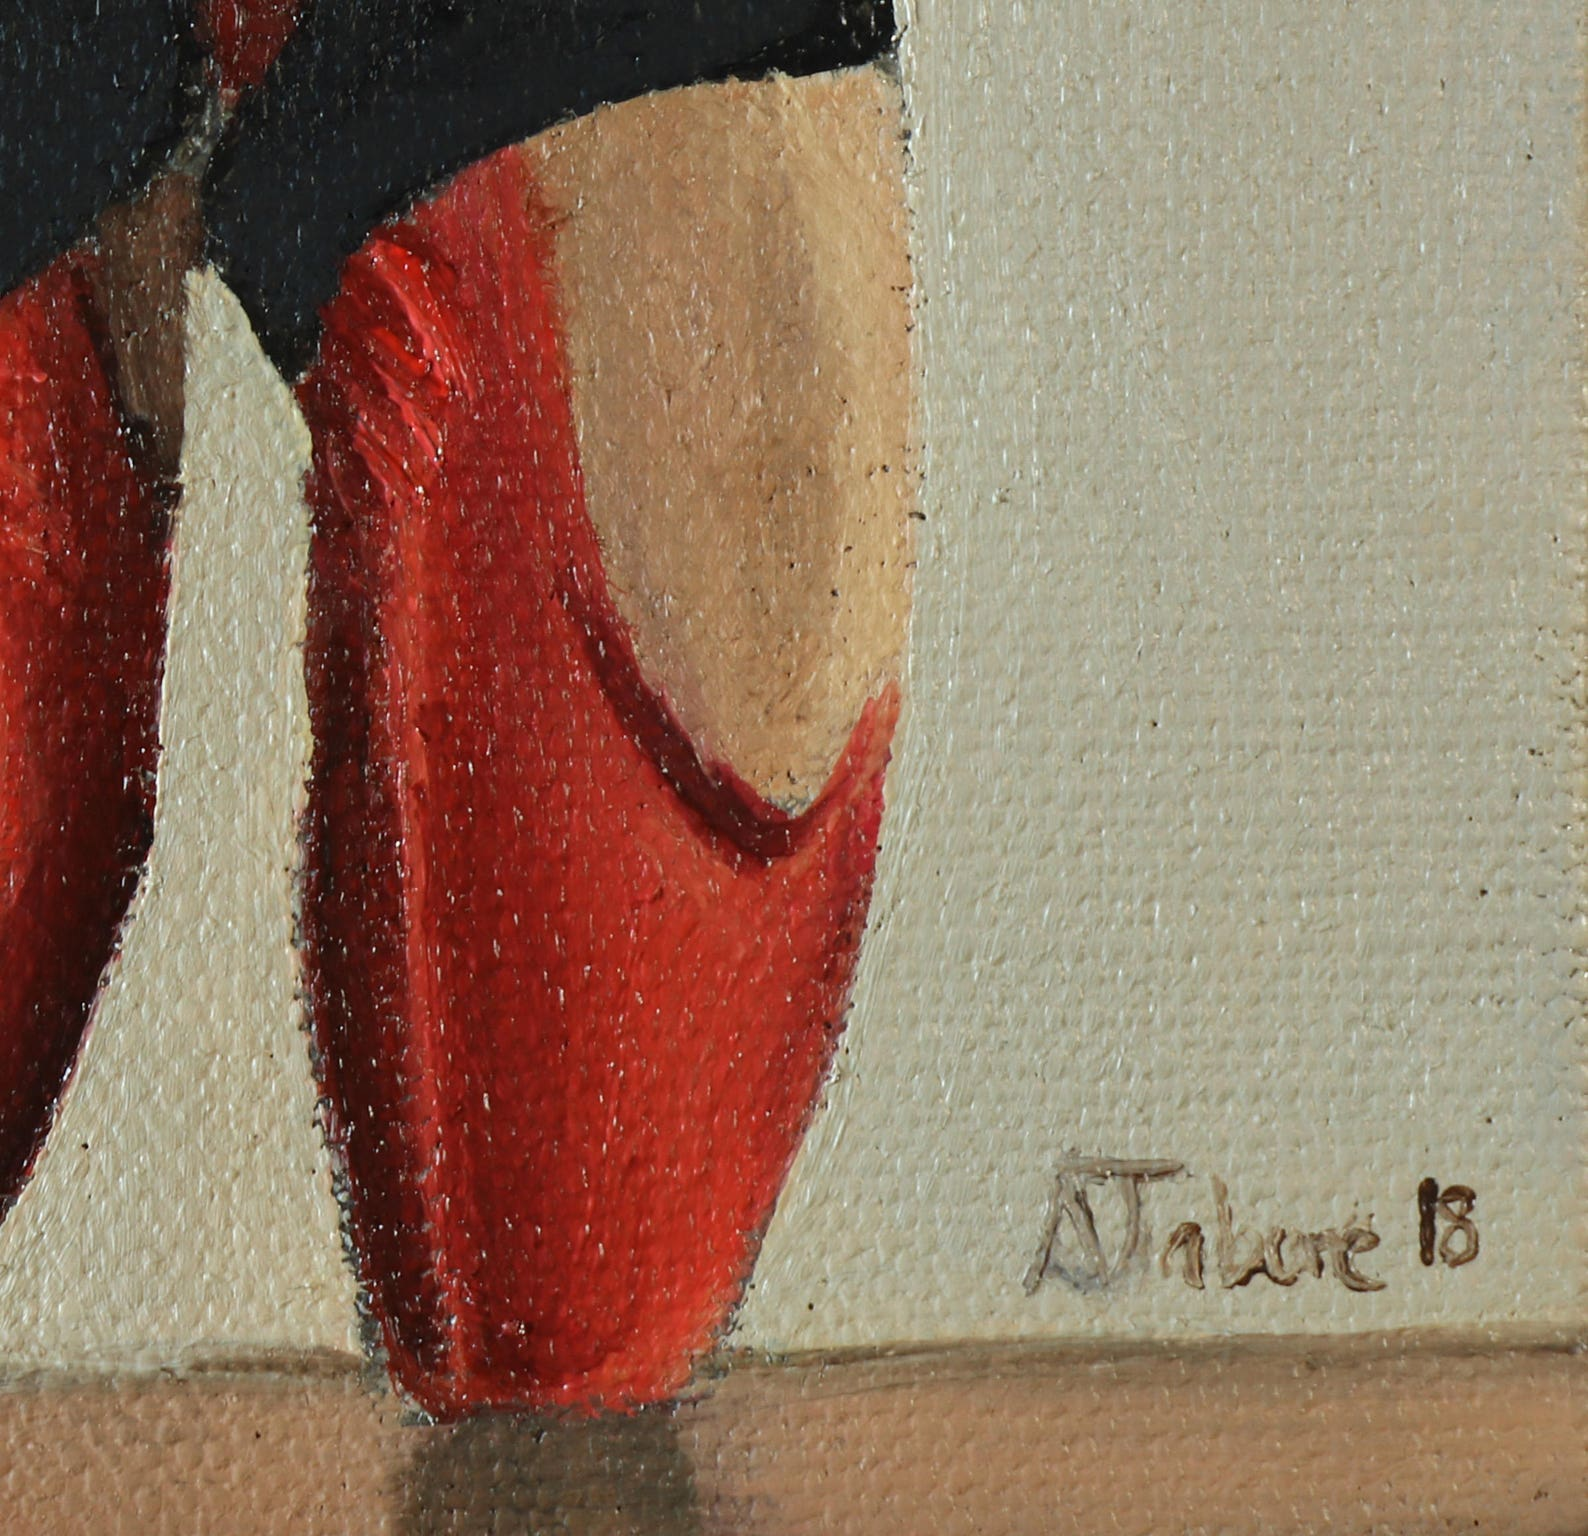 red ballet shoes painting, miniature, wall art, ballet original not print, by uk artist alex jabore